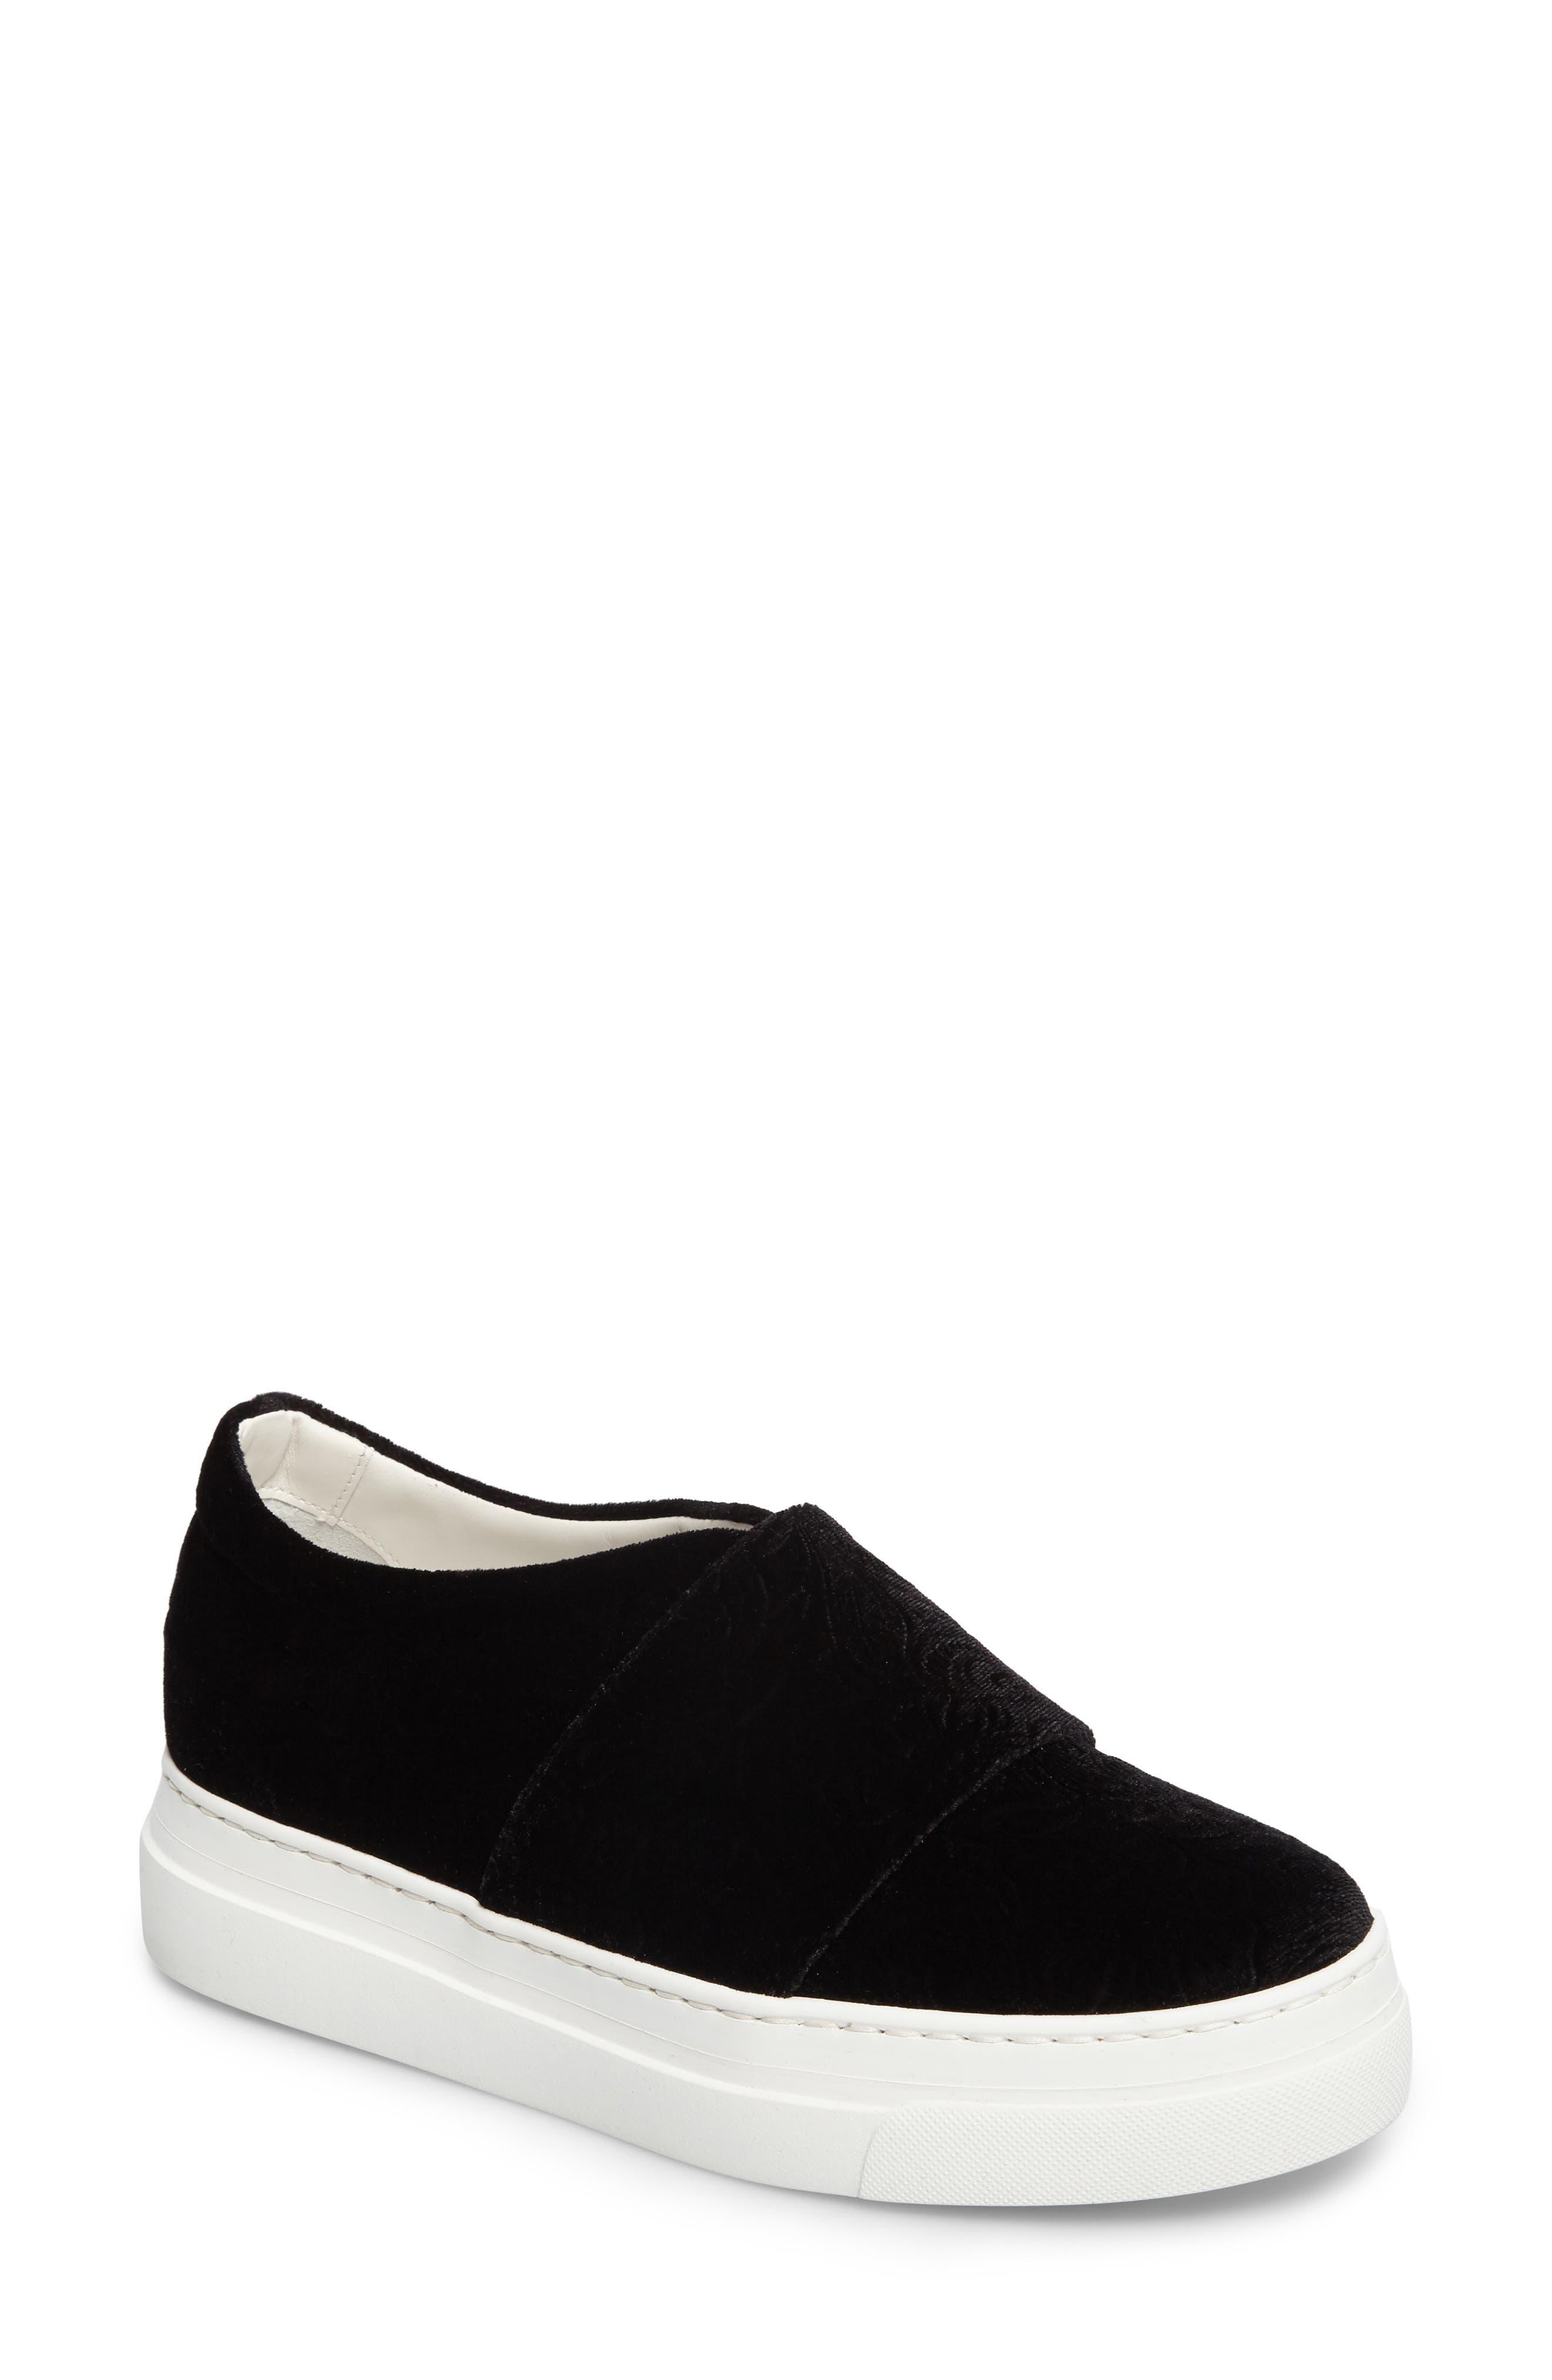 Arlo Slip-On Platform Sneaker,                             Main thumbnail 1, color,                             003